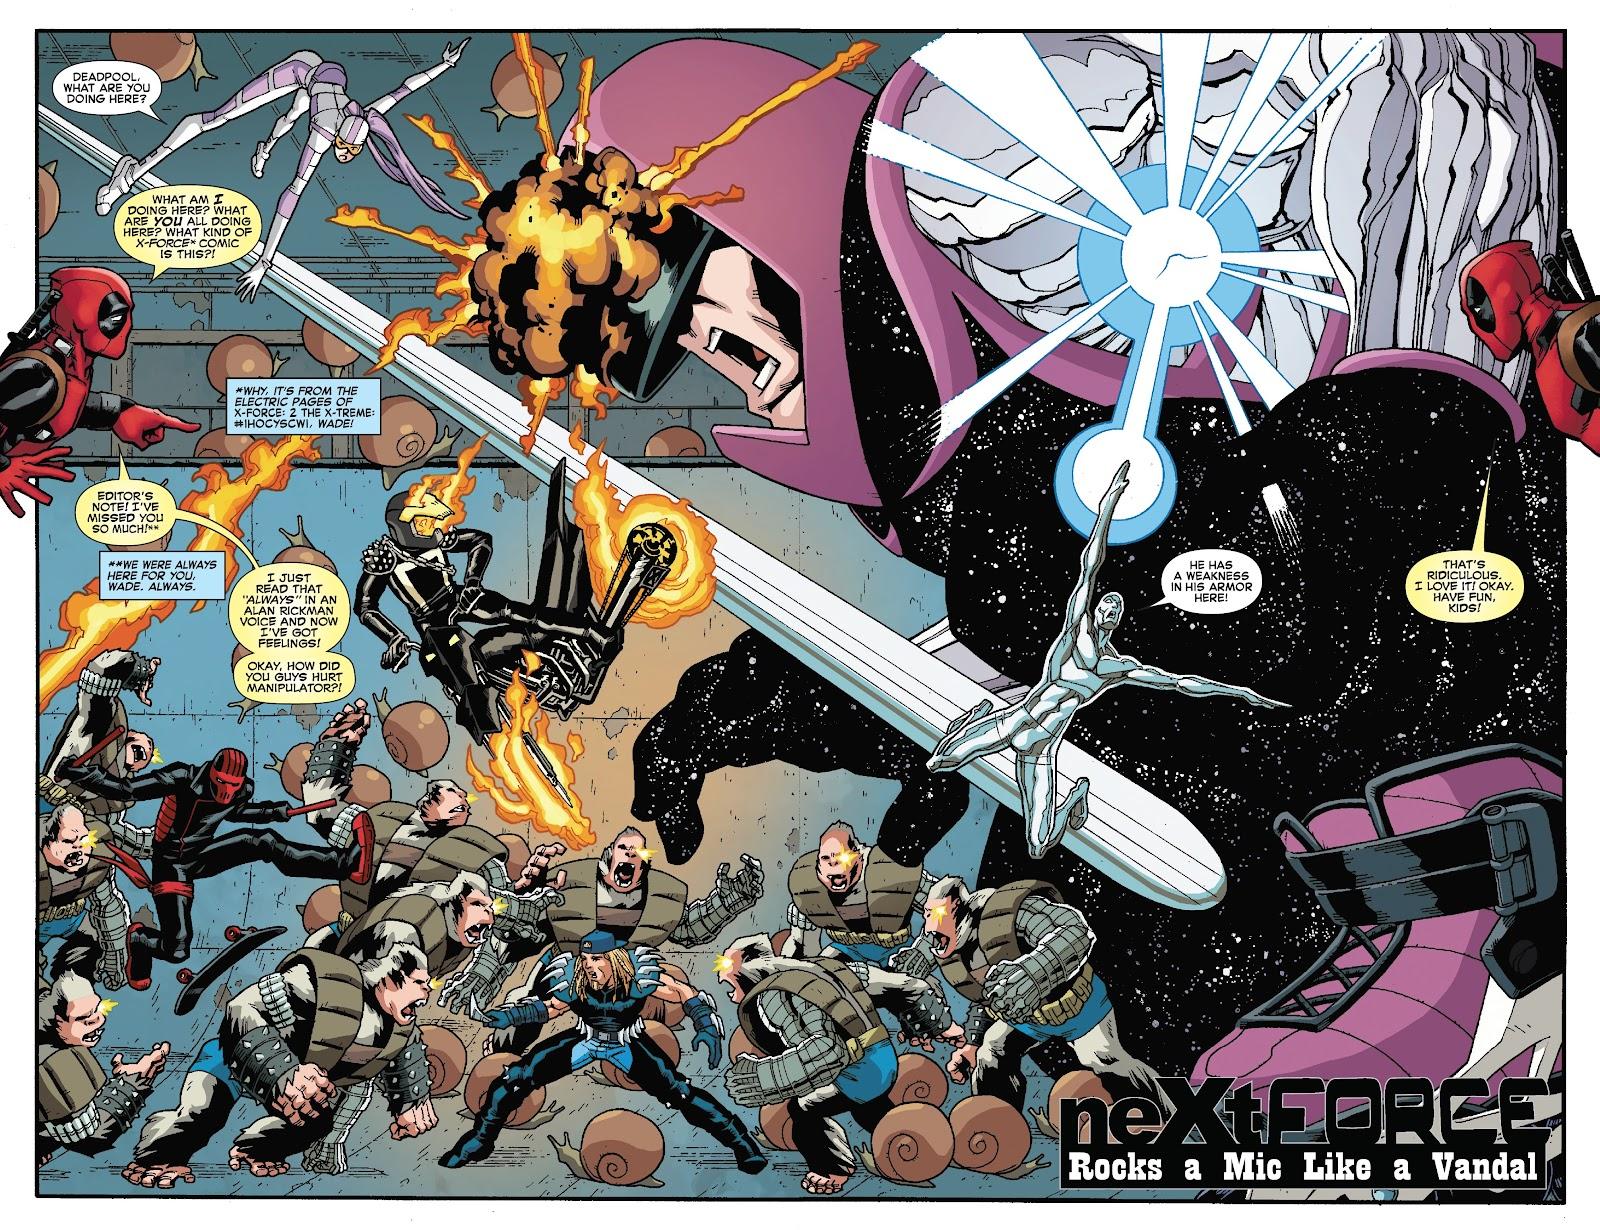 Read online Spider-Man/Deadpool comic -  Issue #50 - 7